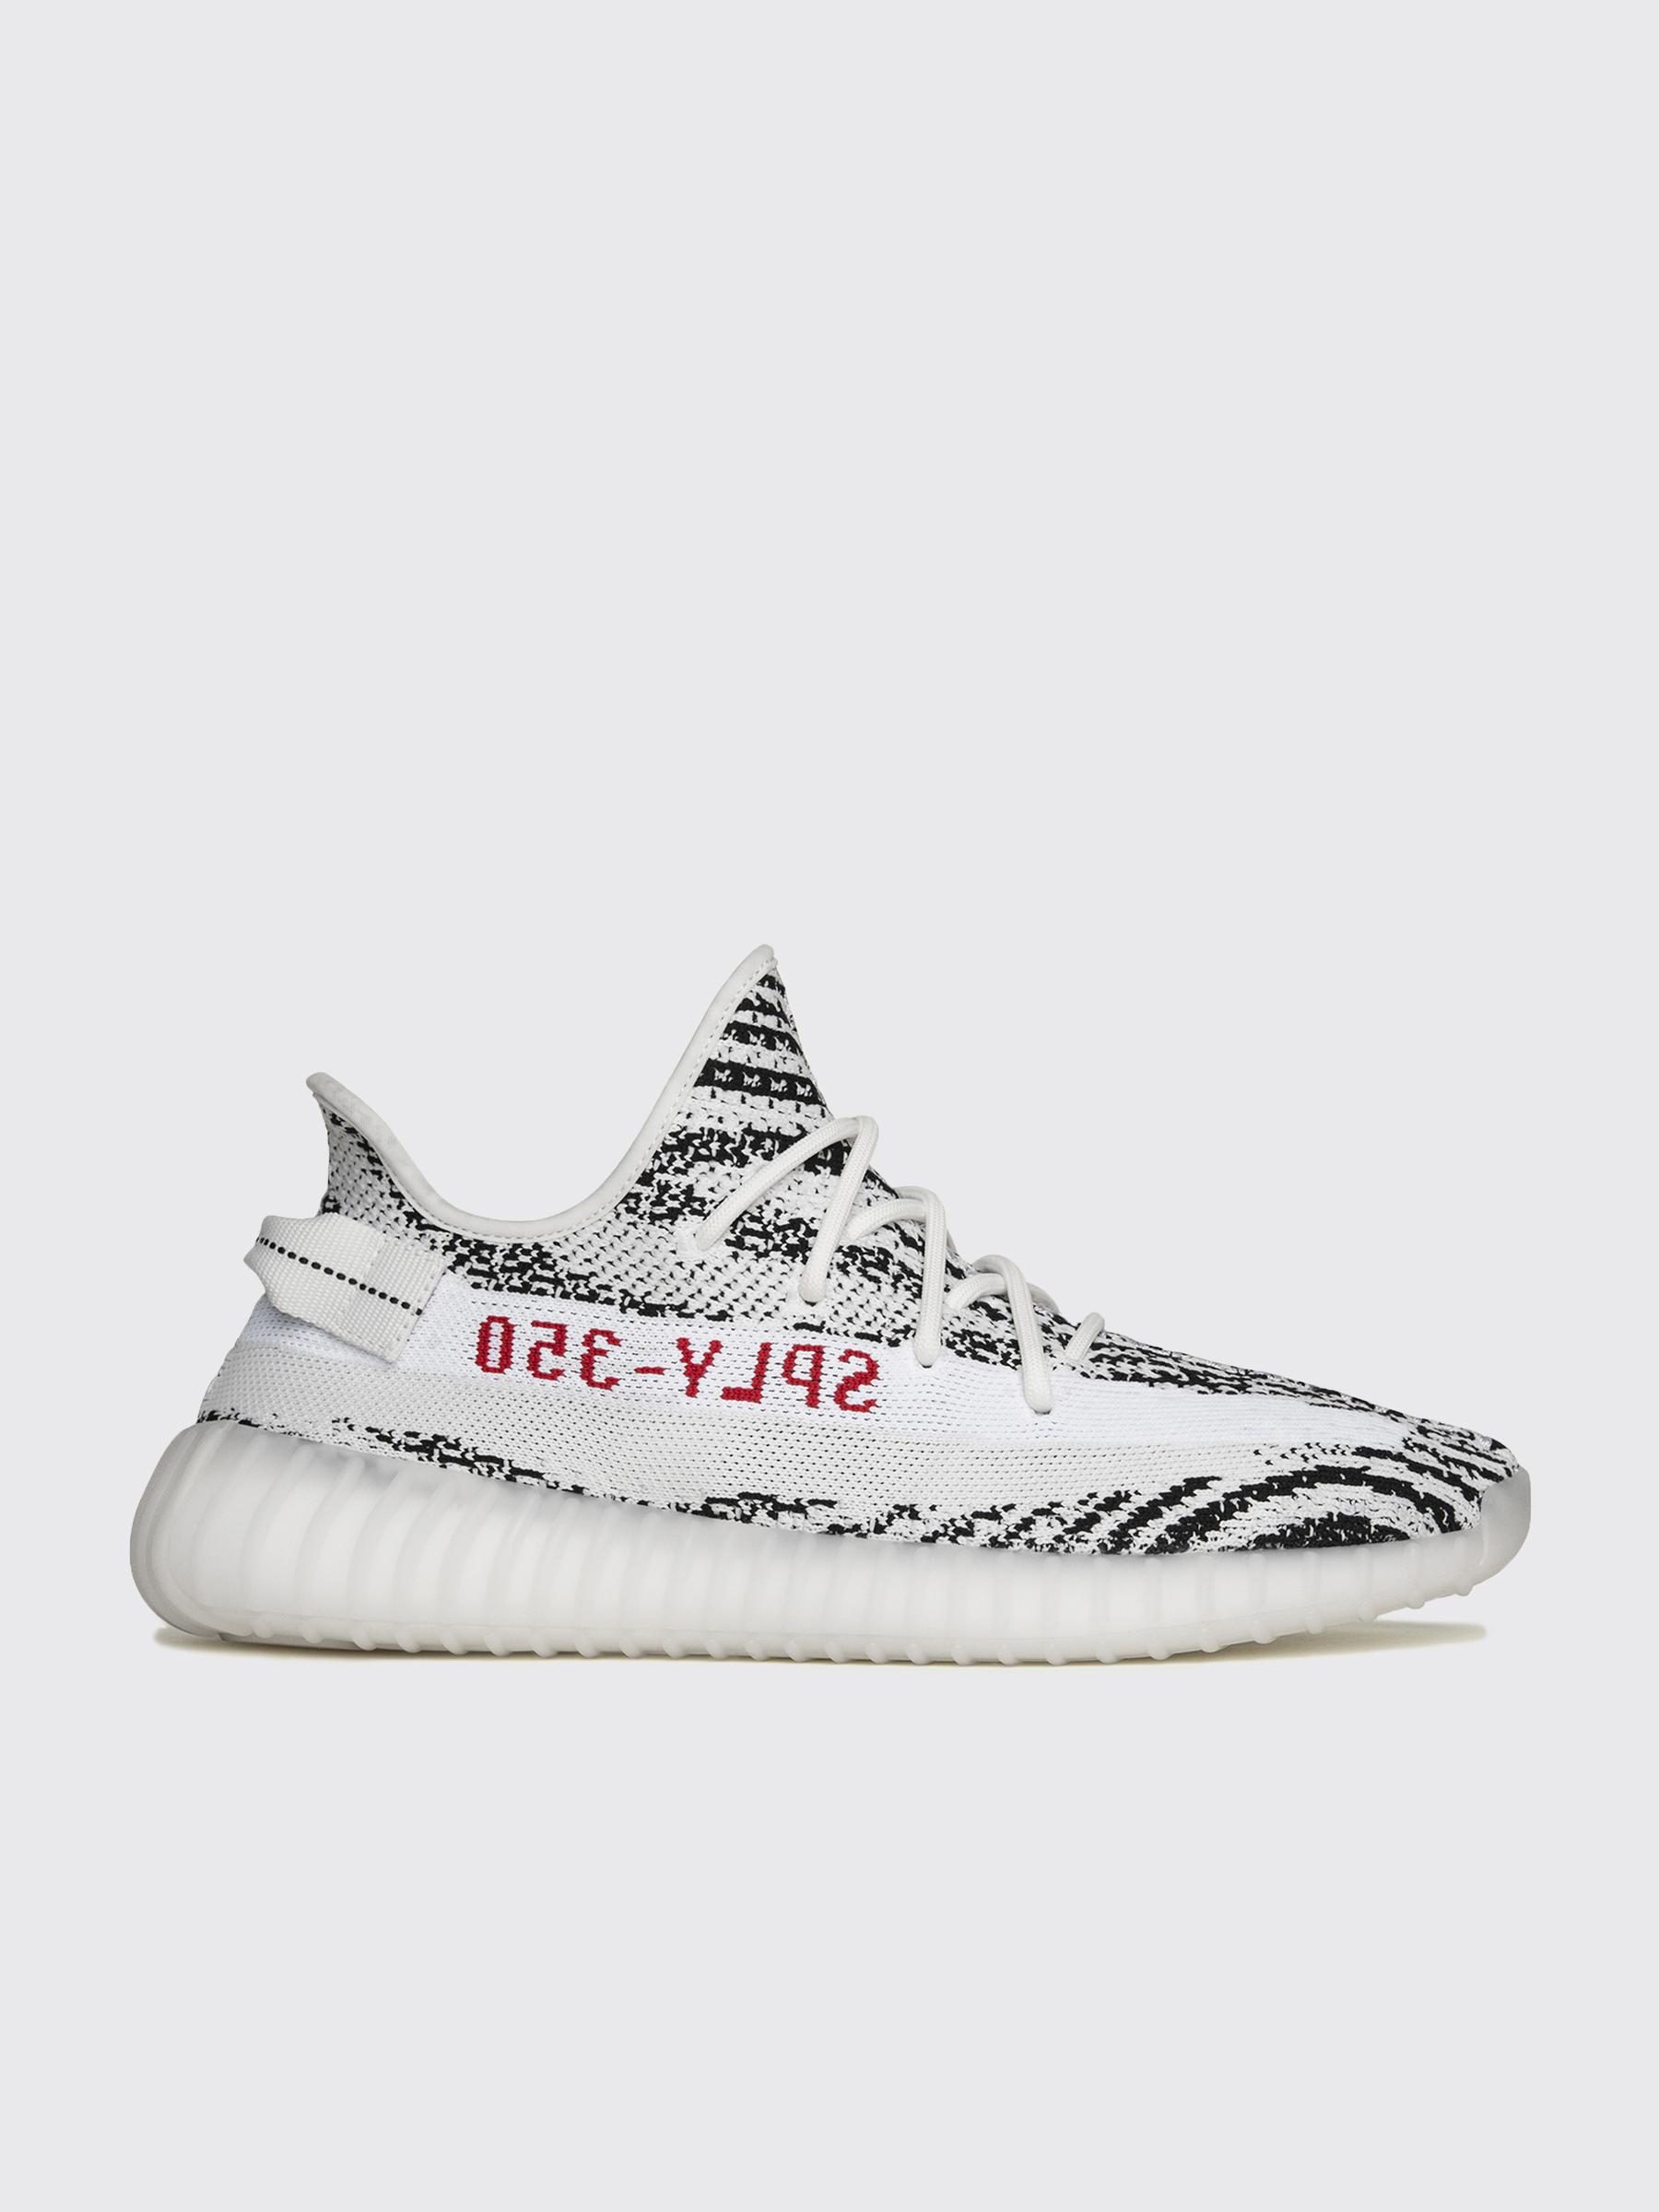 a832bac9e0d Très Bien - Adidas Yeezy Boost 350 V2 Zebra